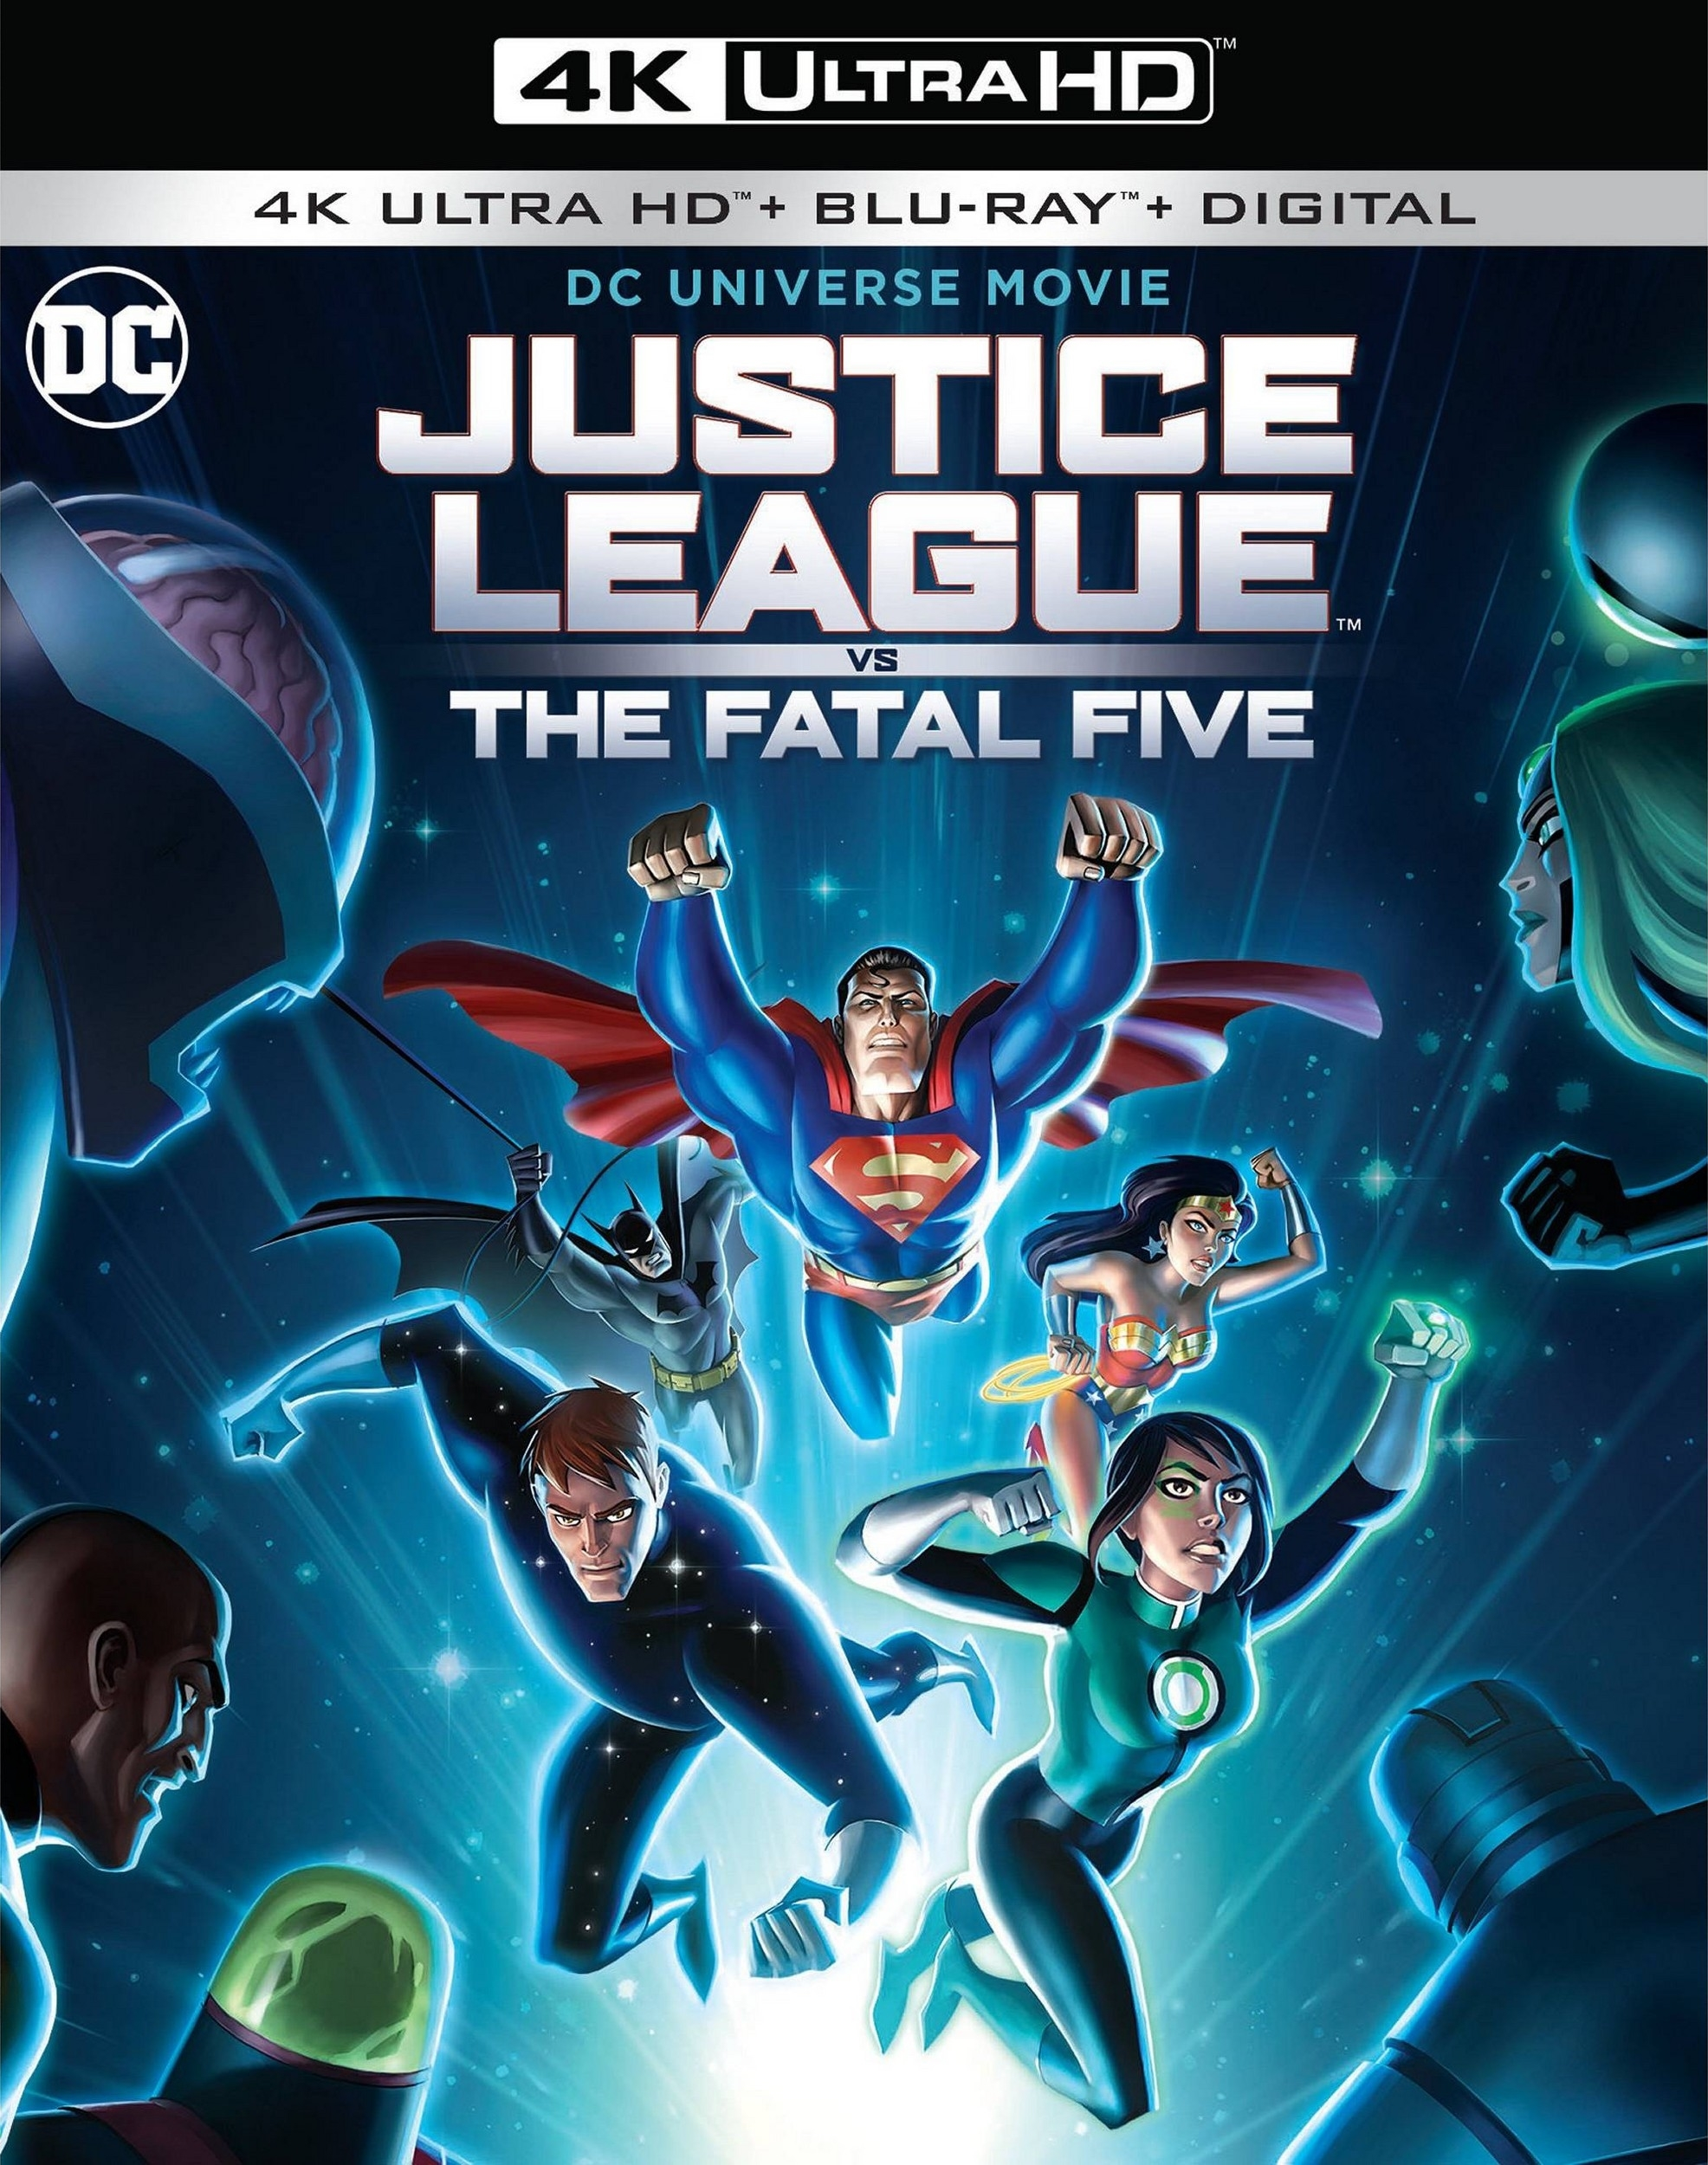 Justice League vs The Fatal Five (4K Ultra HD Blu-ray)(Pre-order / Apr 16)